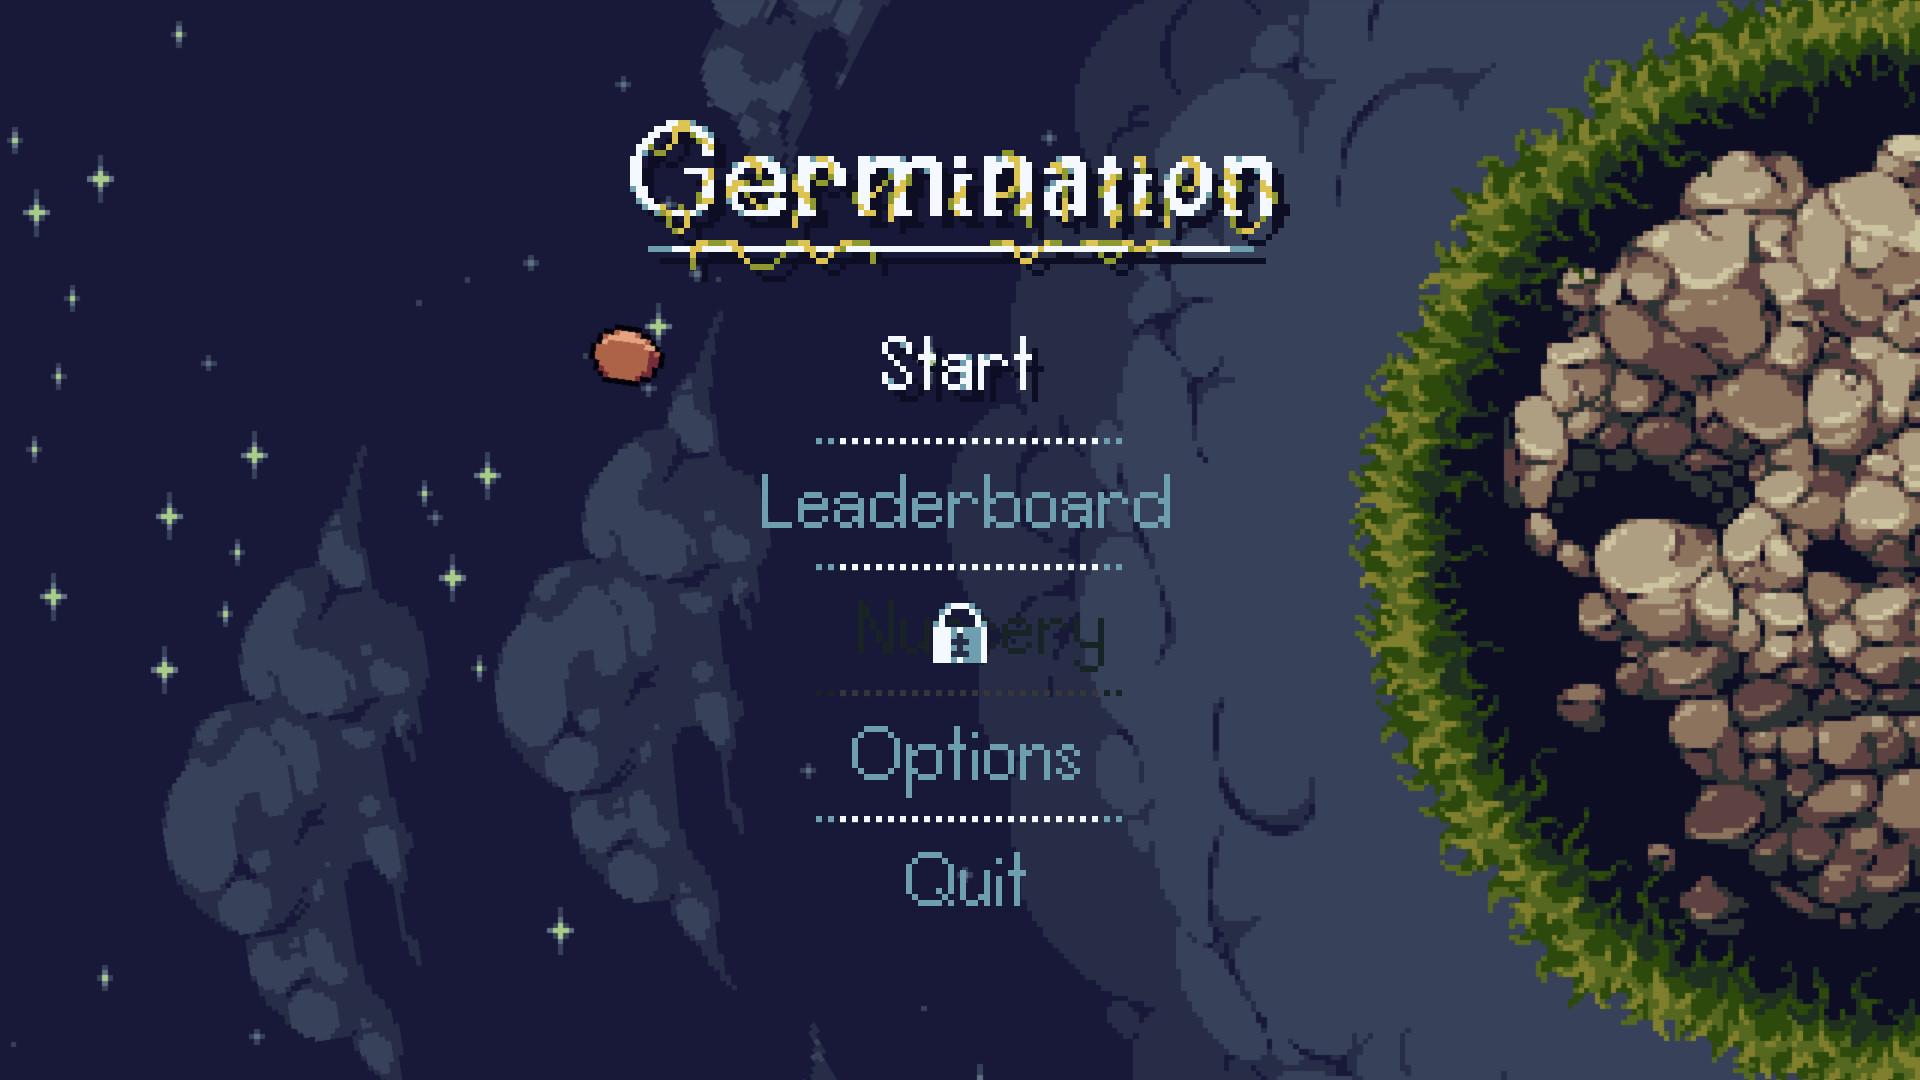 Germination screenshot